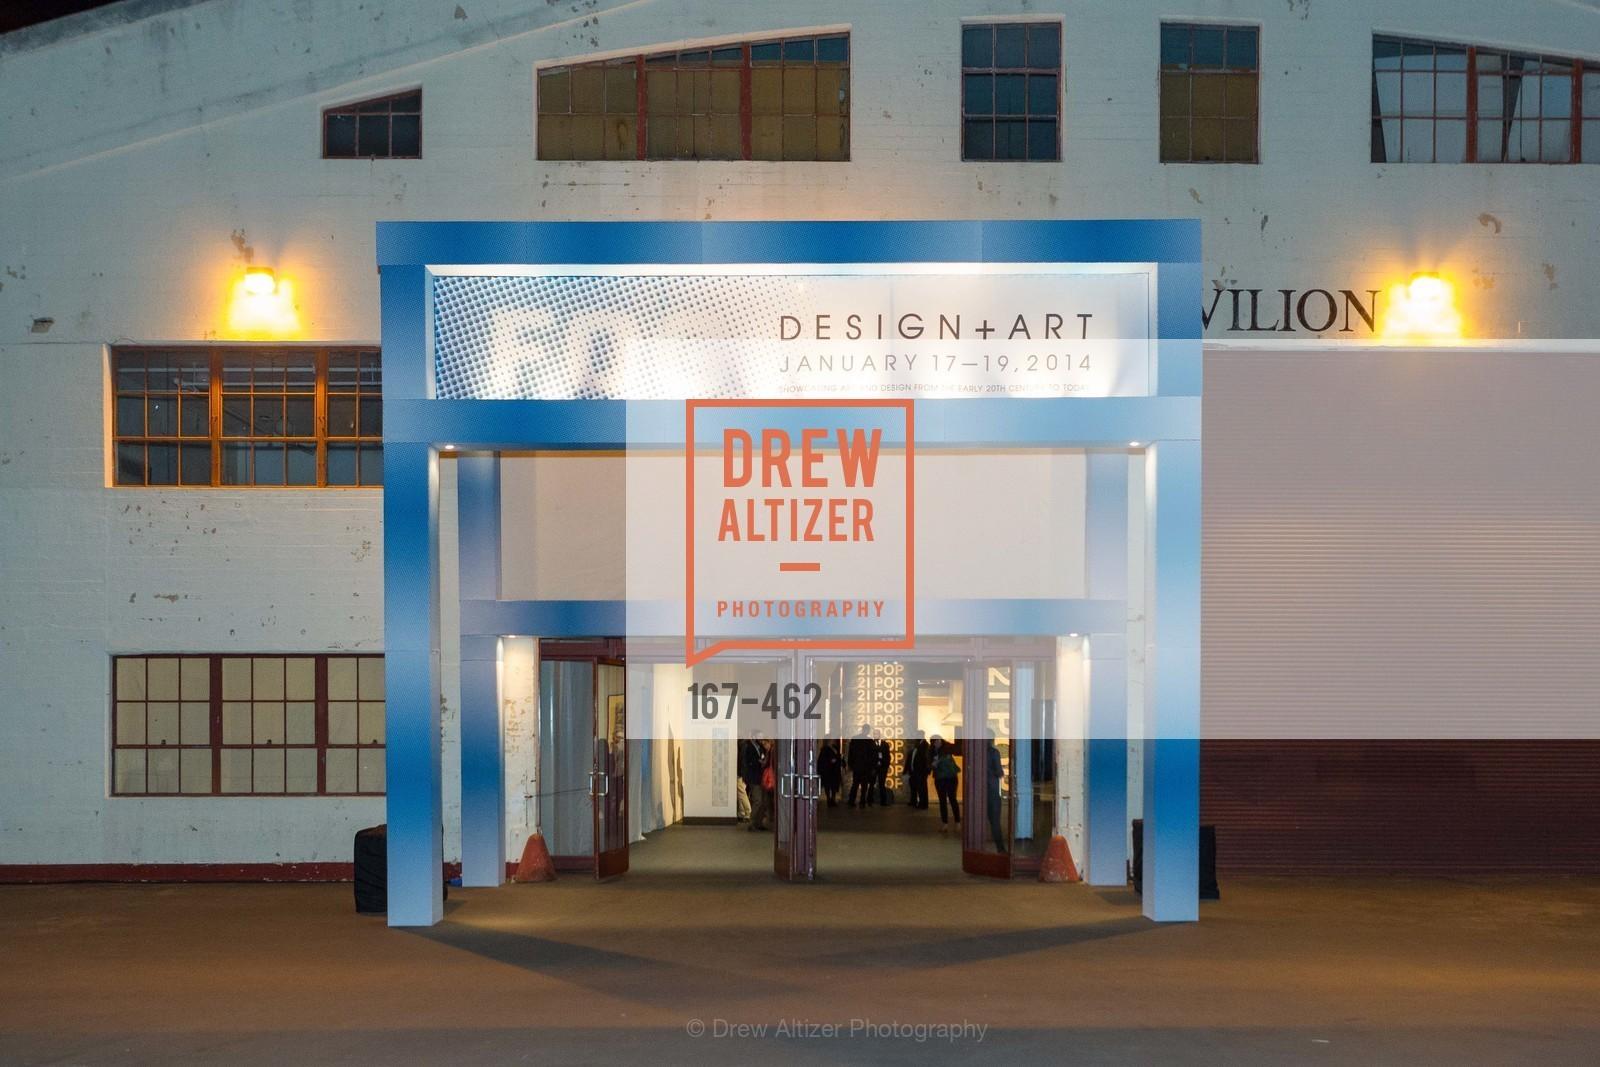 Atmosphere, FOG Design + Art Designers Forum Preview, US. Fort Mason Festival Pavilion, January 15th, 2014,Drew Altizer, Drew Altizer Photography, full-service event agency, private events, San Francisco photographer, photographer California